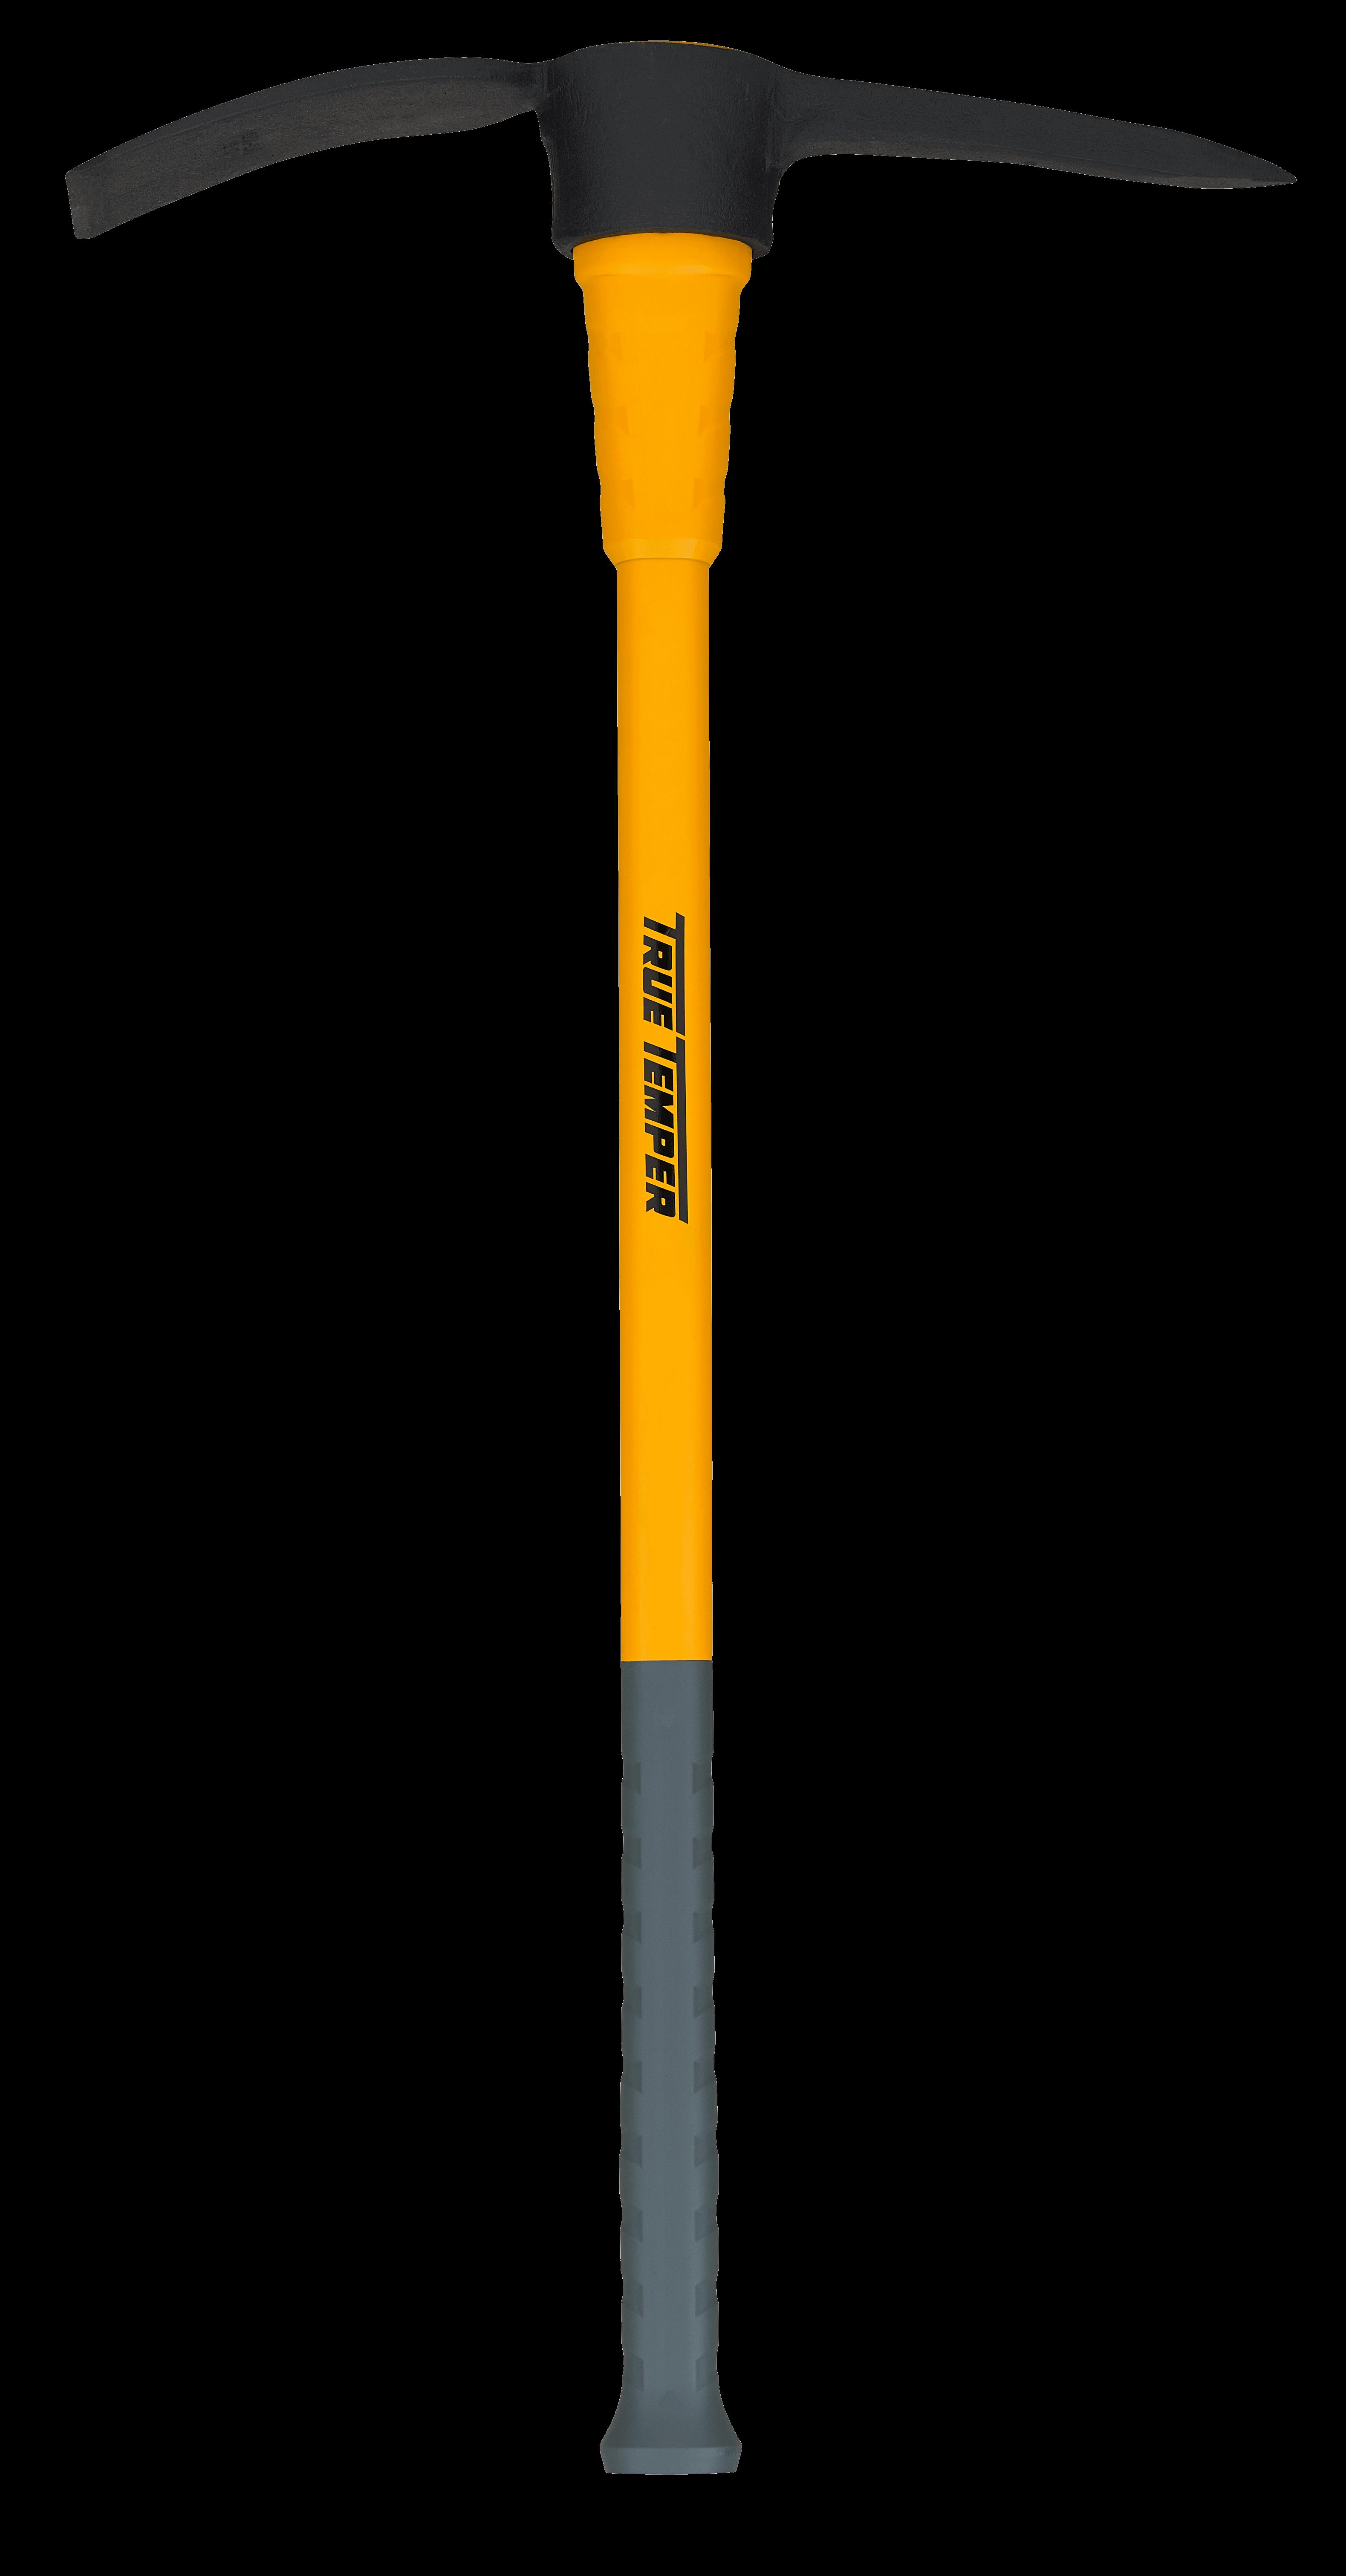 Preston Dura Extreme 5 Pole Float Selections